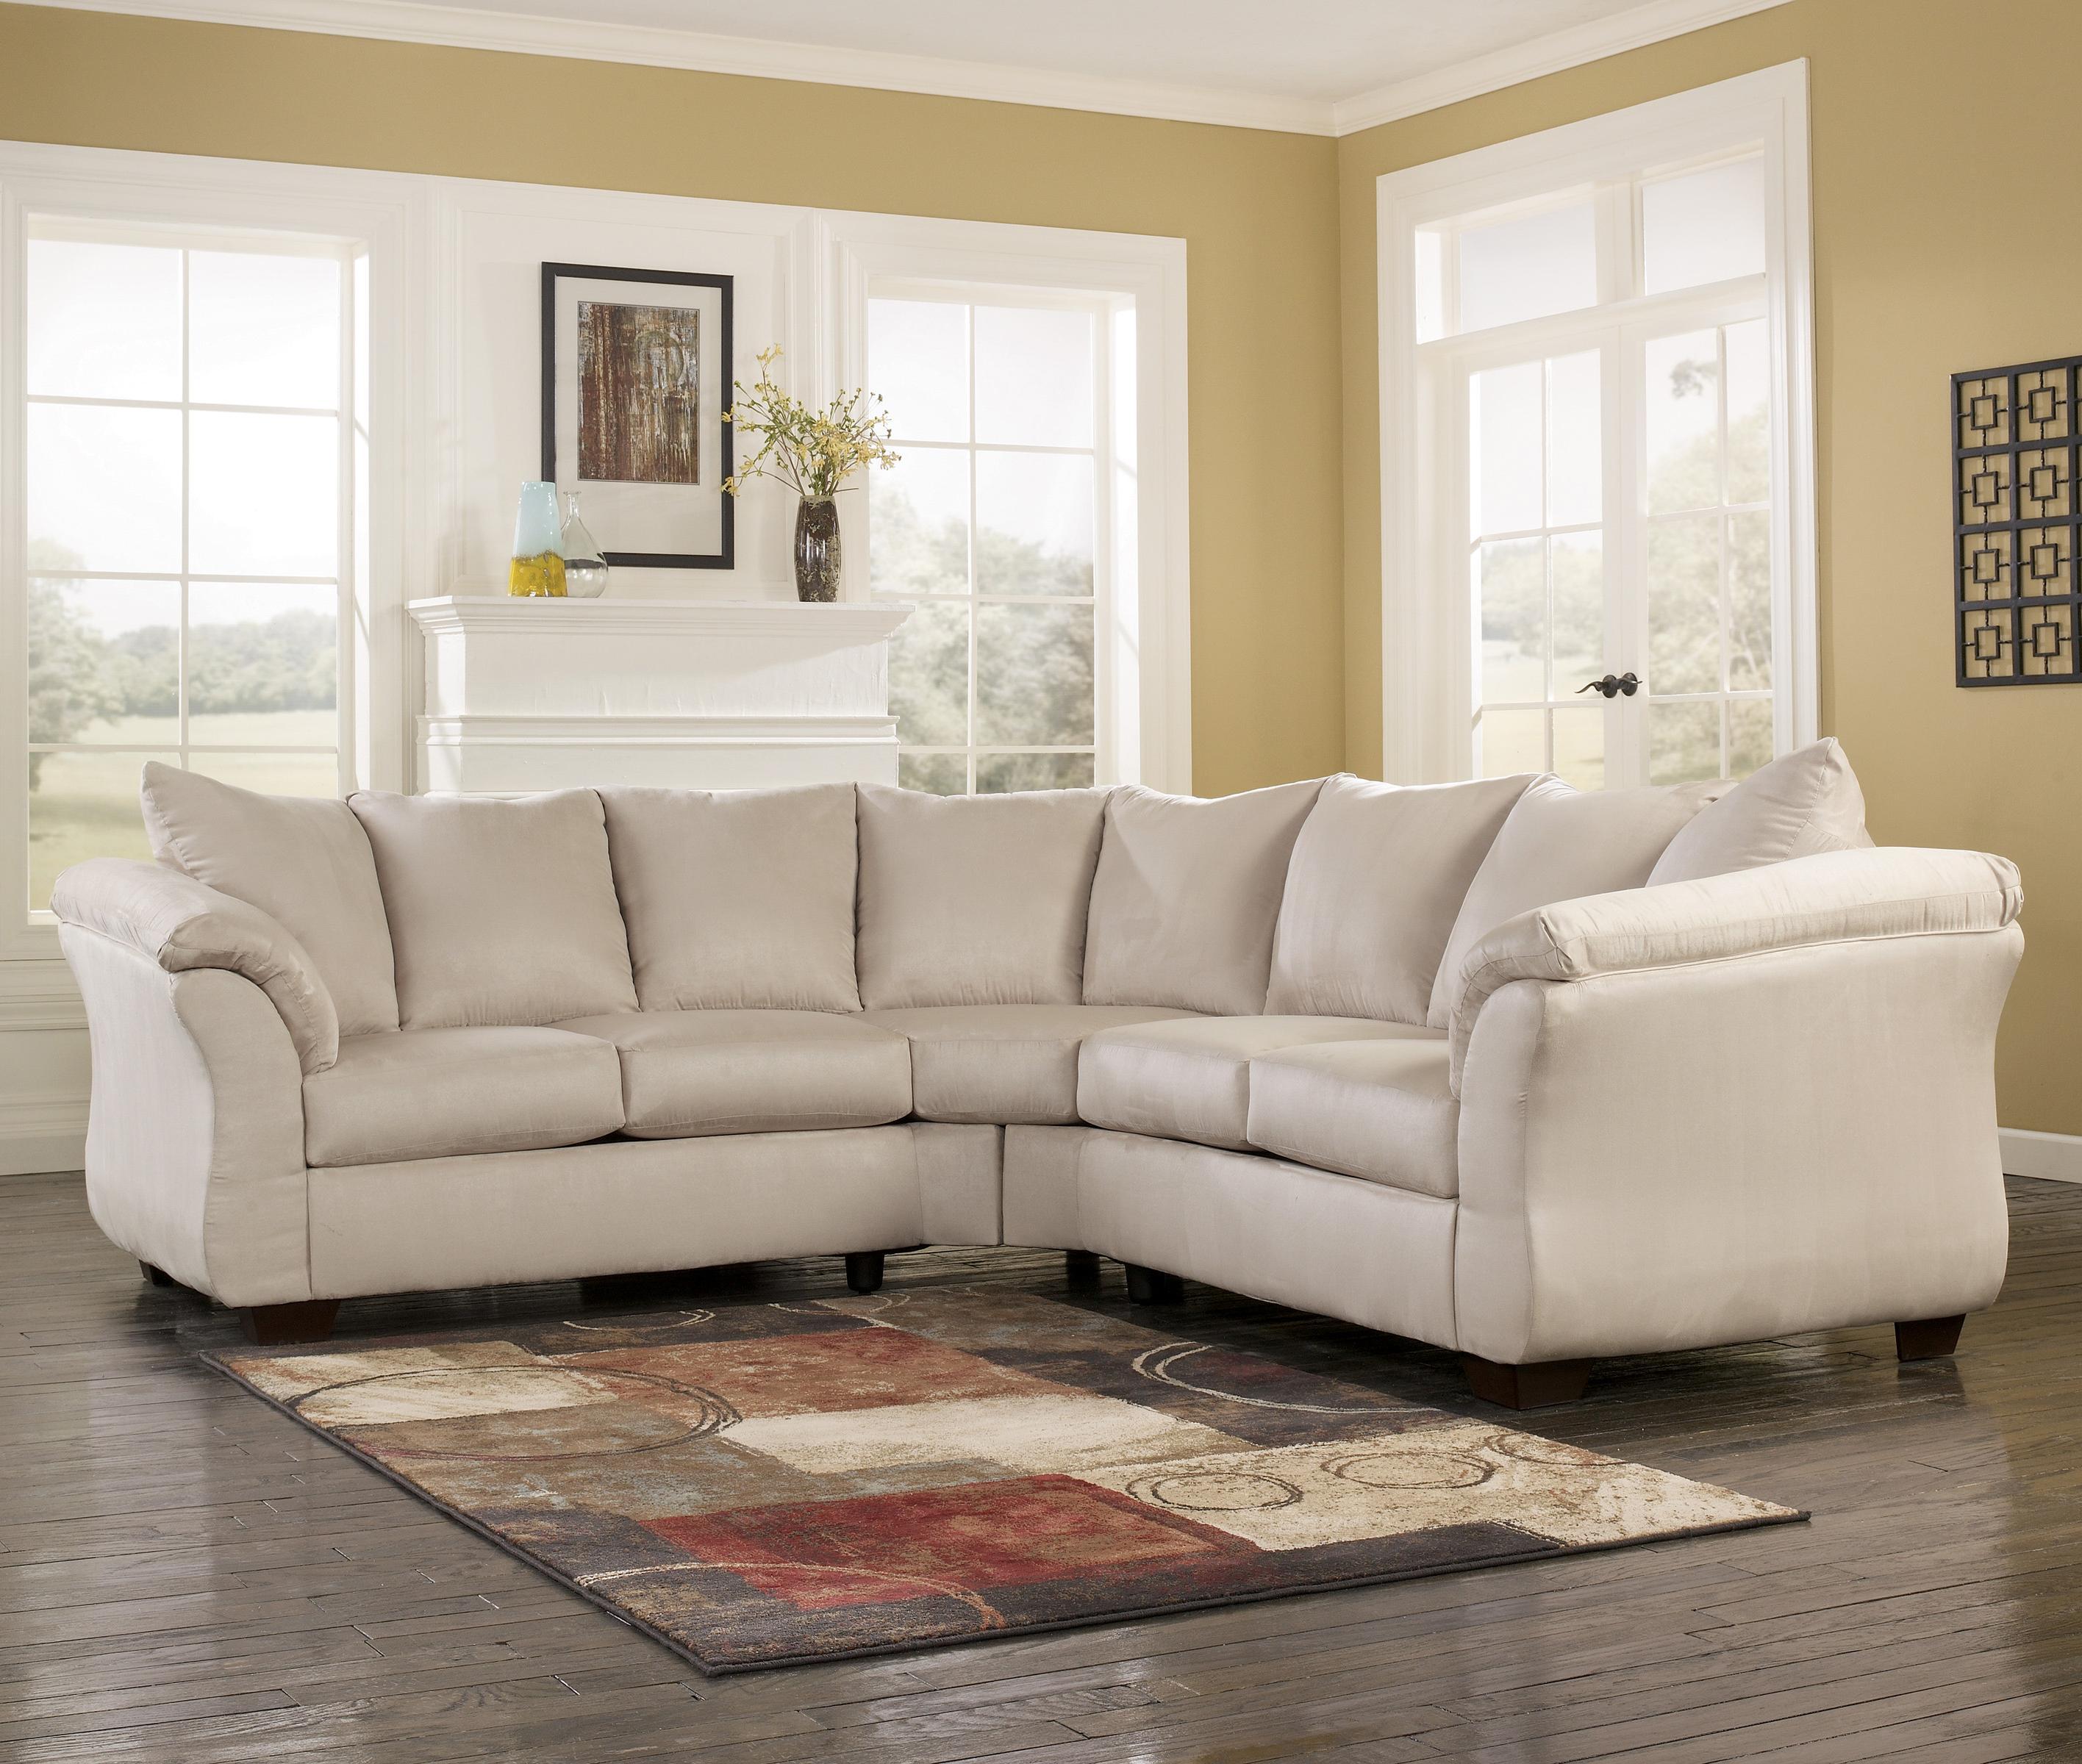 Ashley Furniture Outlet Orlando: Ashley (Signature Design) Darcy